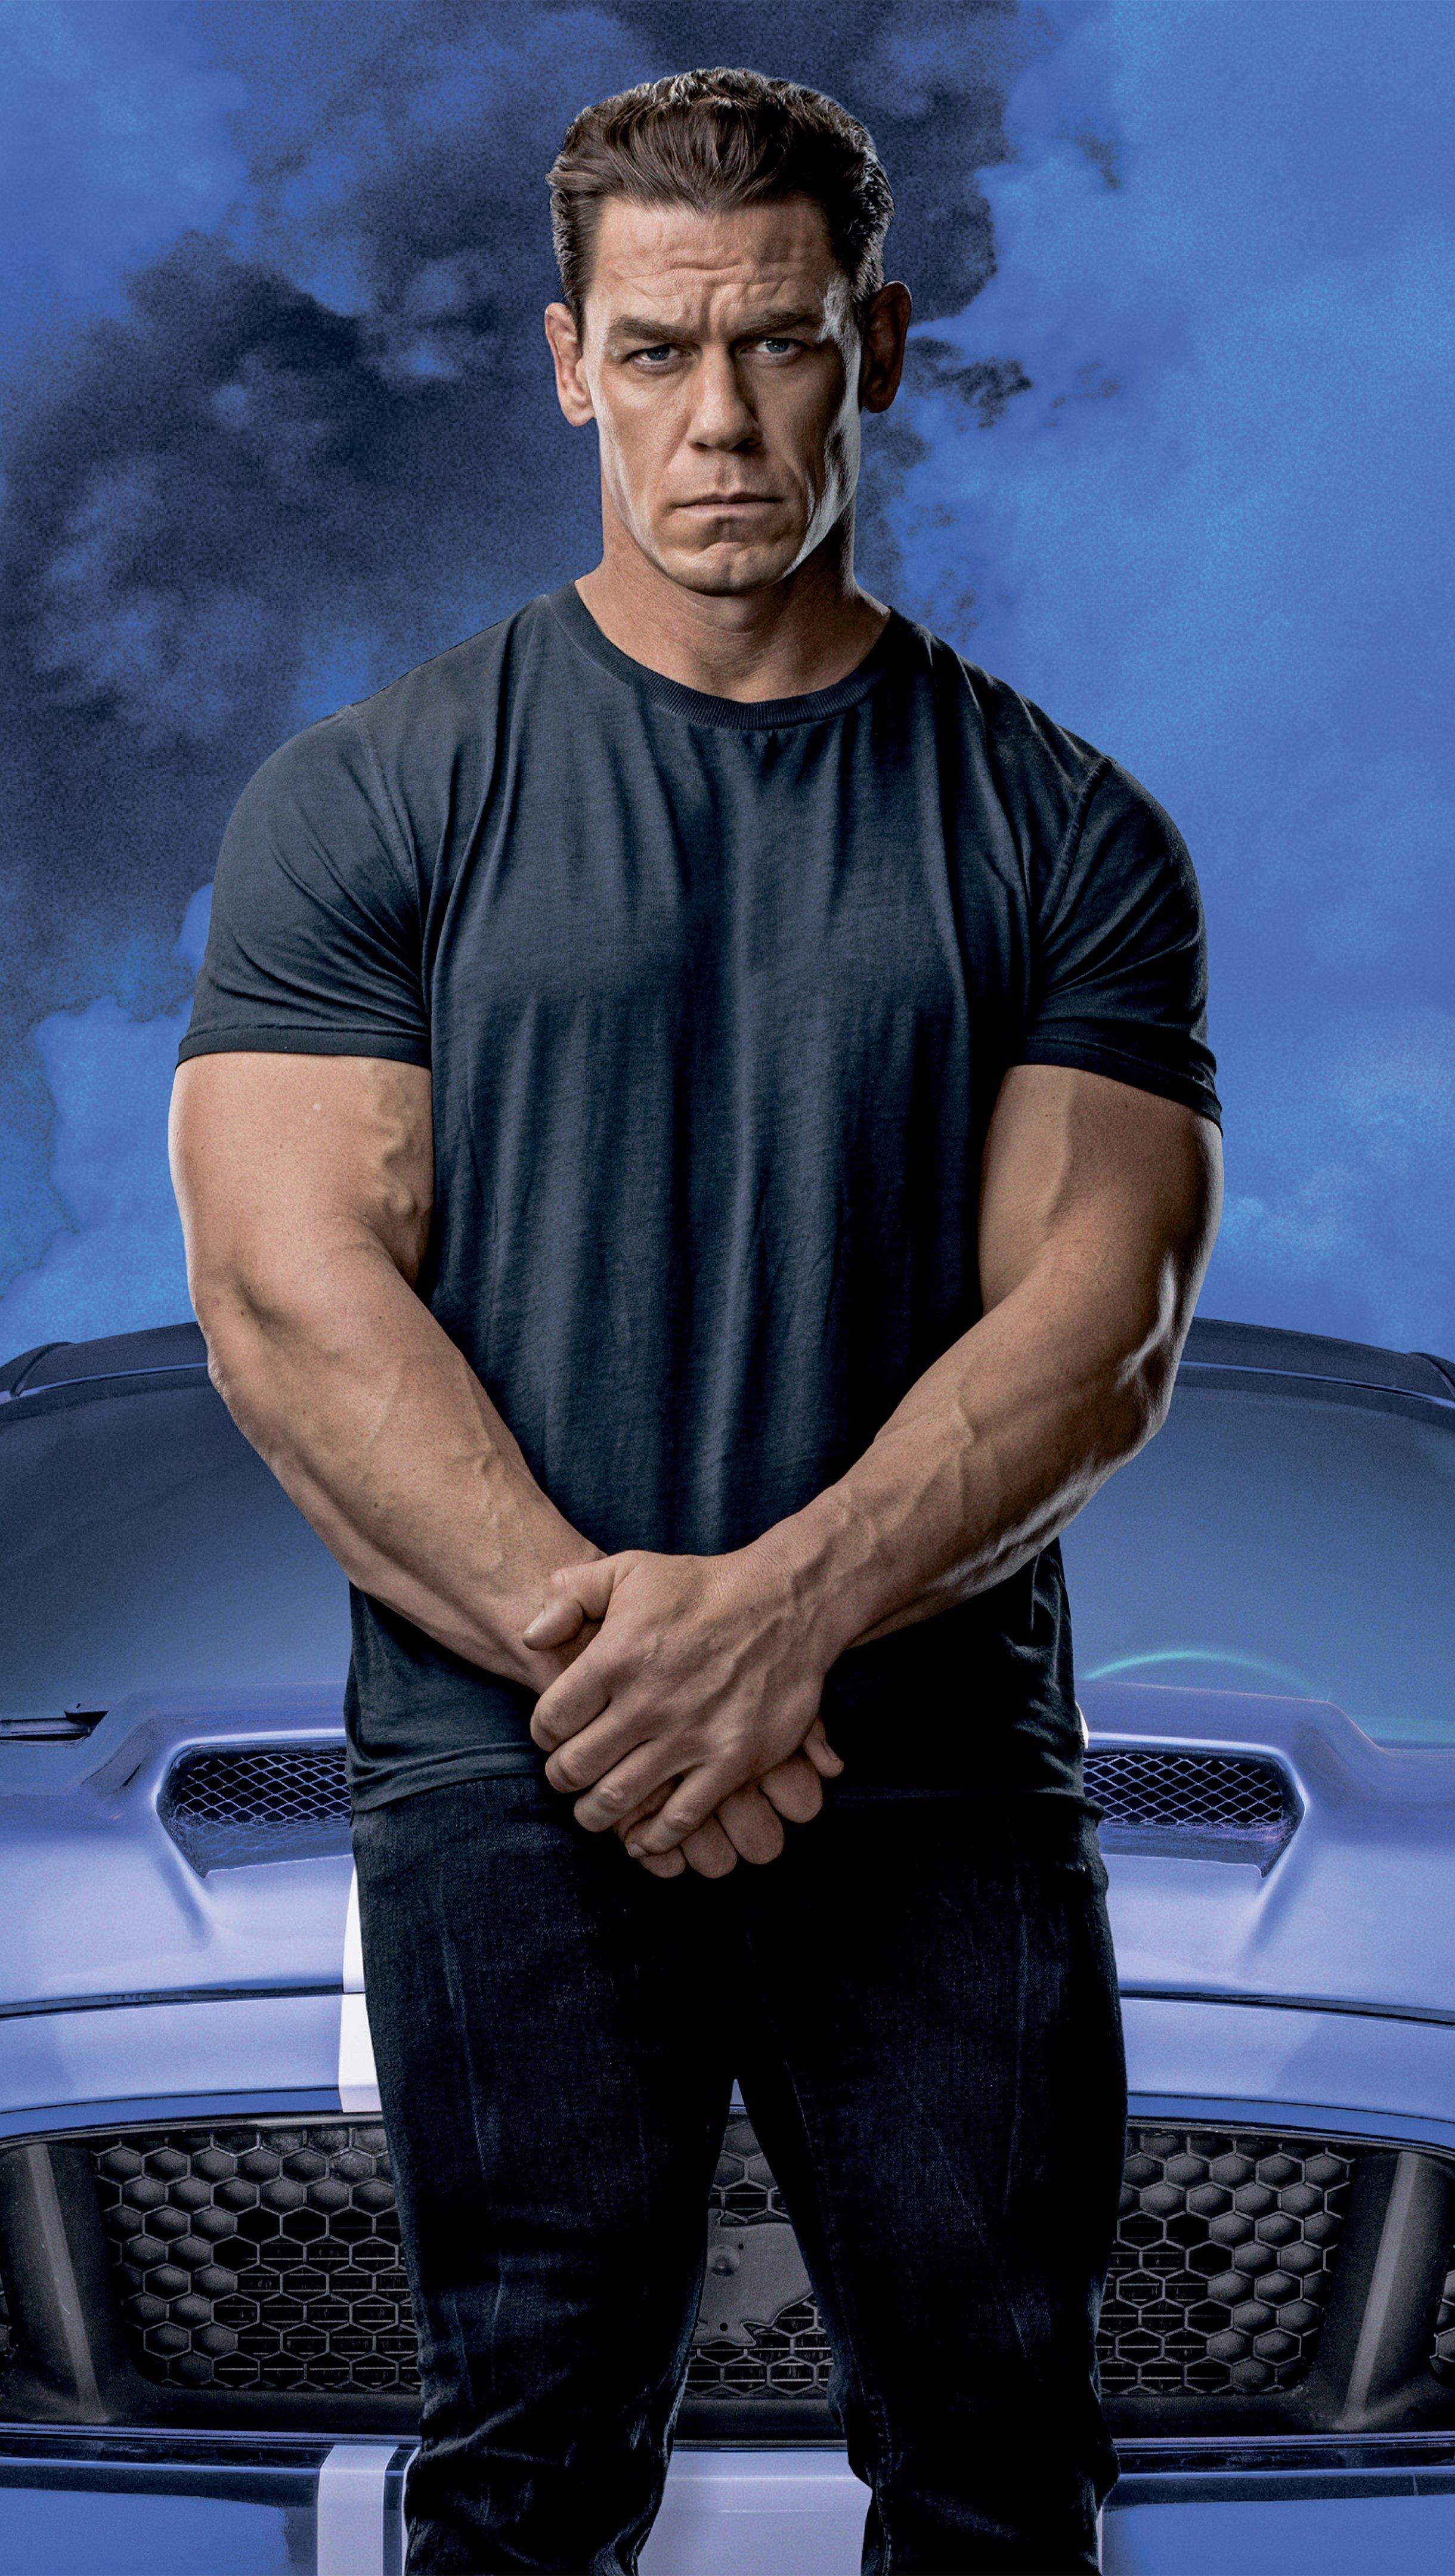 Fondos de pantalla John Cena Jakob Toretto en Rapidos y Furiosos 9 Vertical